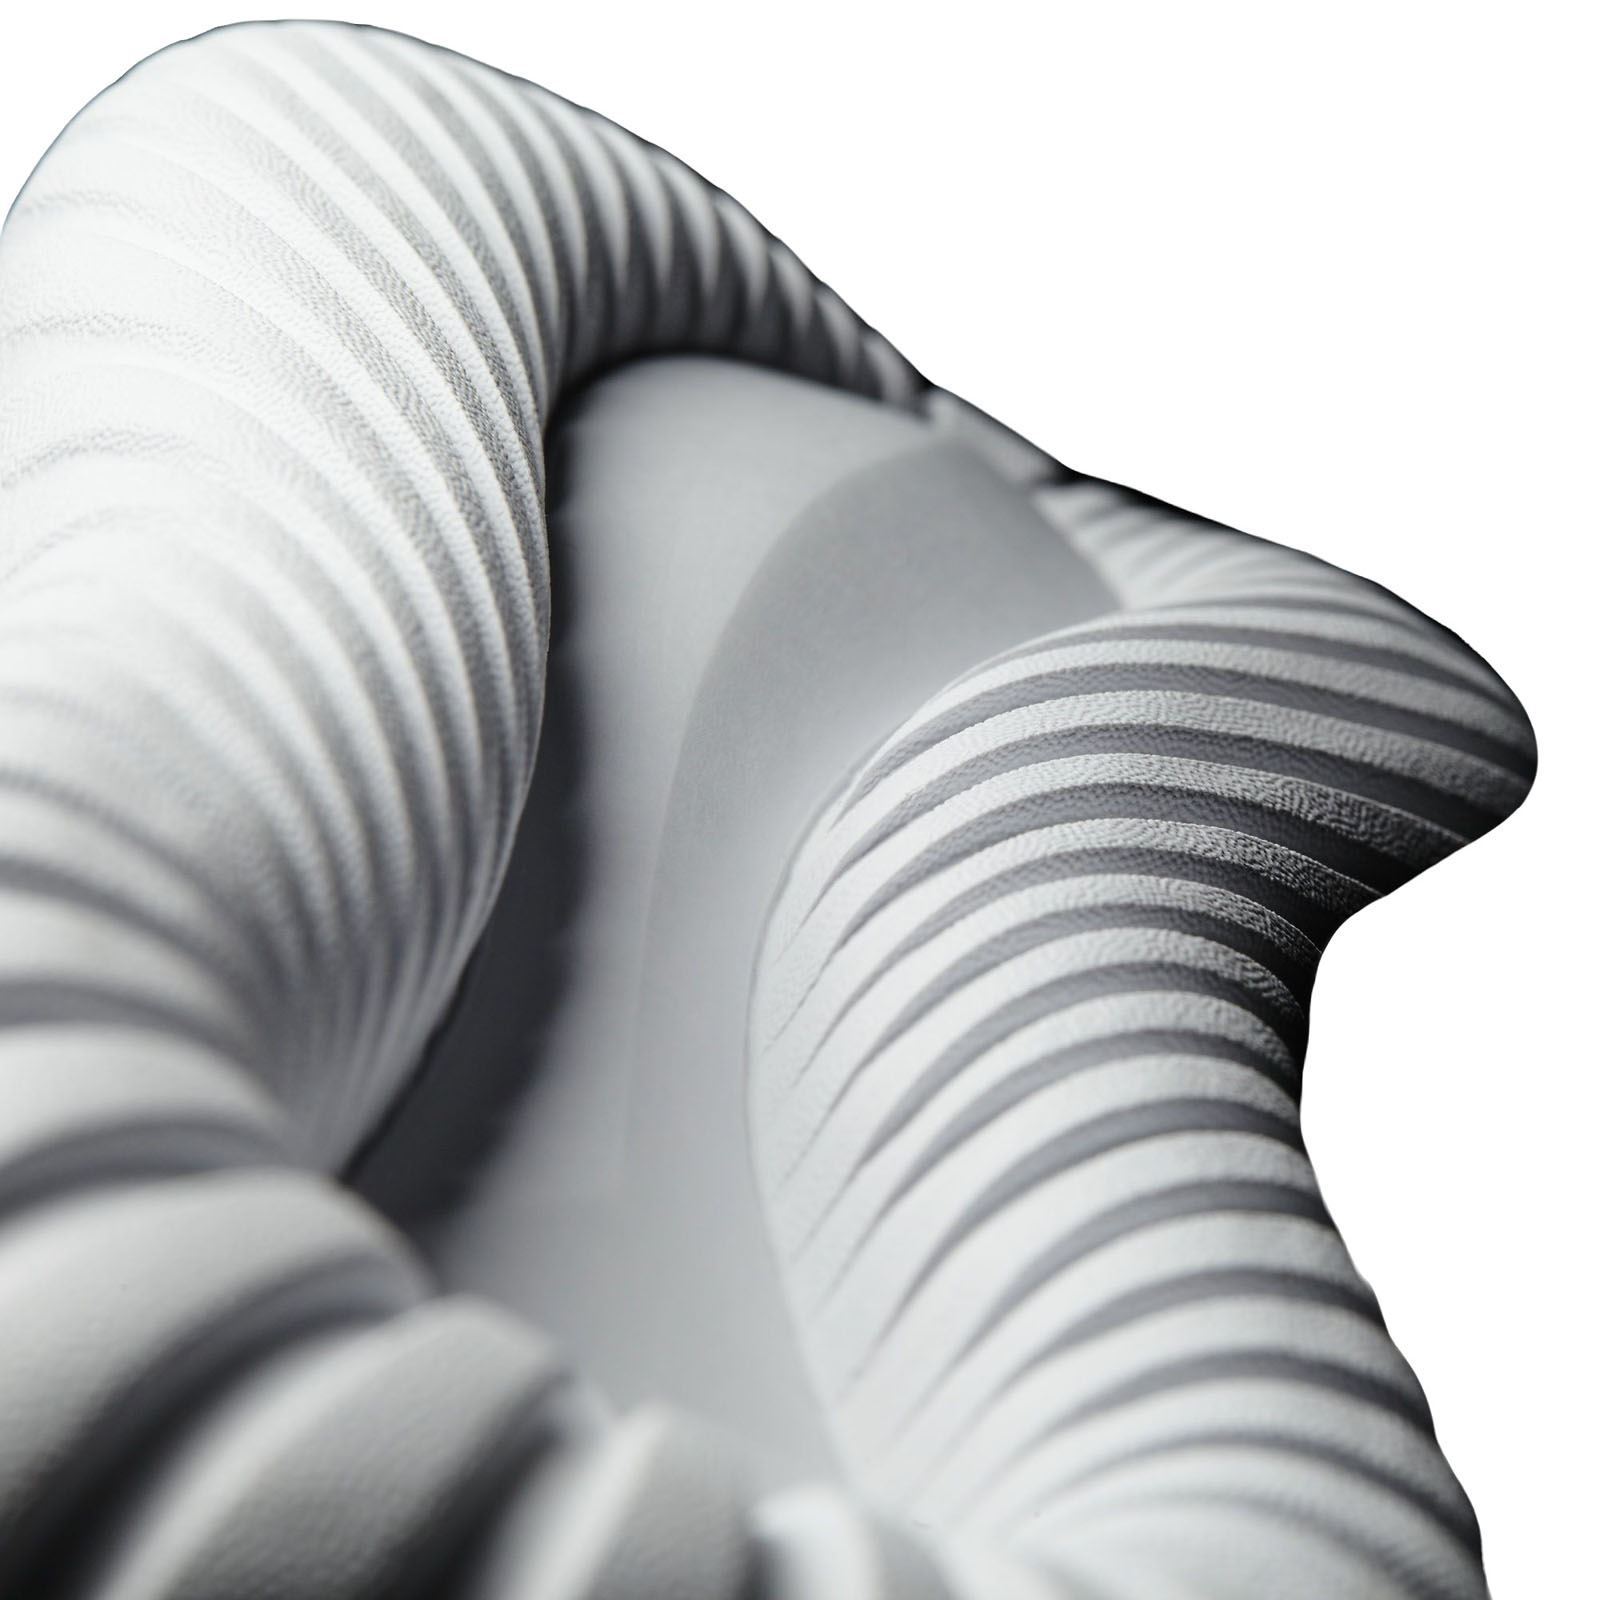 Adidas Tubular Tubular Tubular Radial & Nova PKMens TrainersOriginalsCLEARANCE DEALALL GrößeS 4d2743